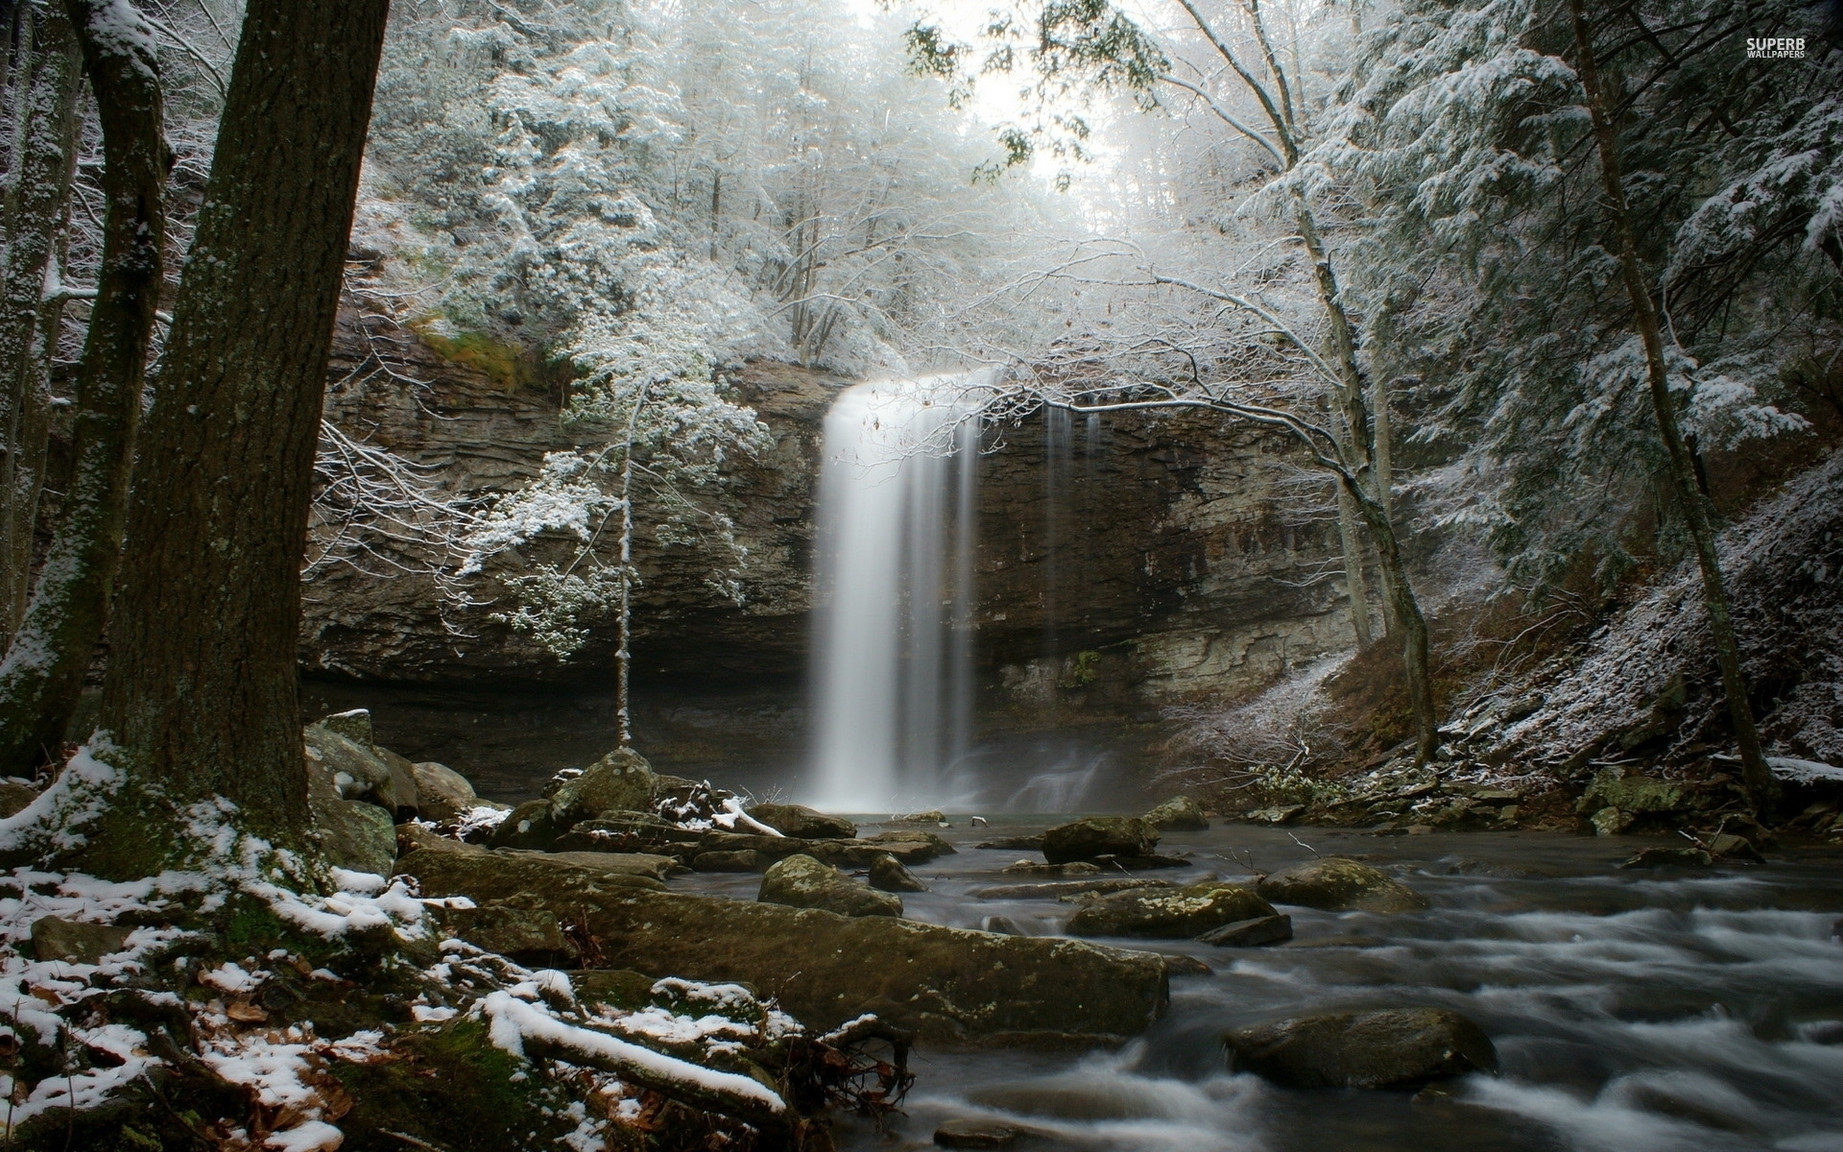 ws_Waterfall_Forest_Rocks_Winter_1920x12